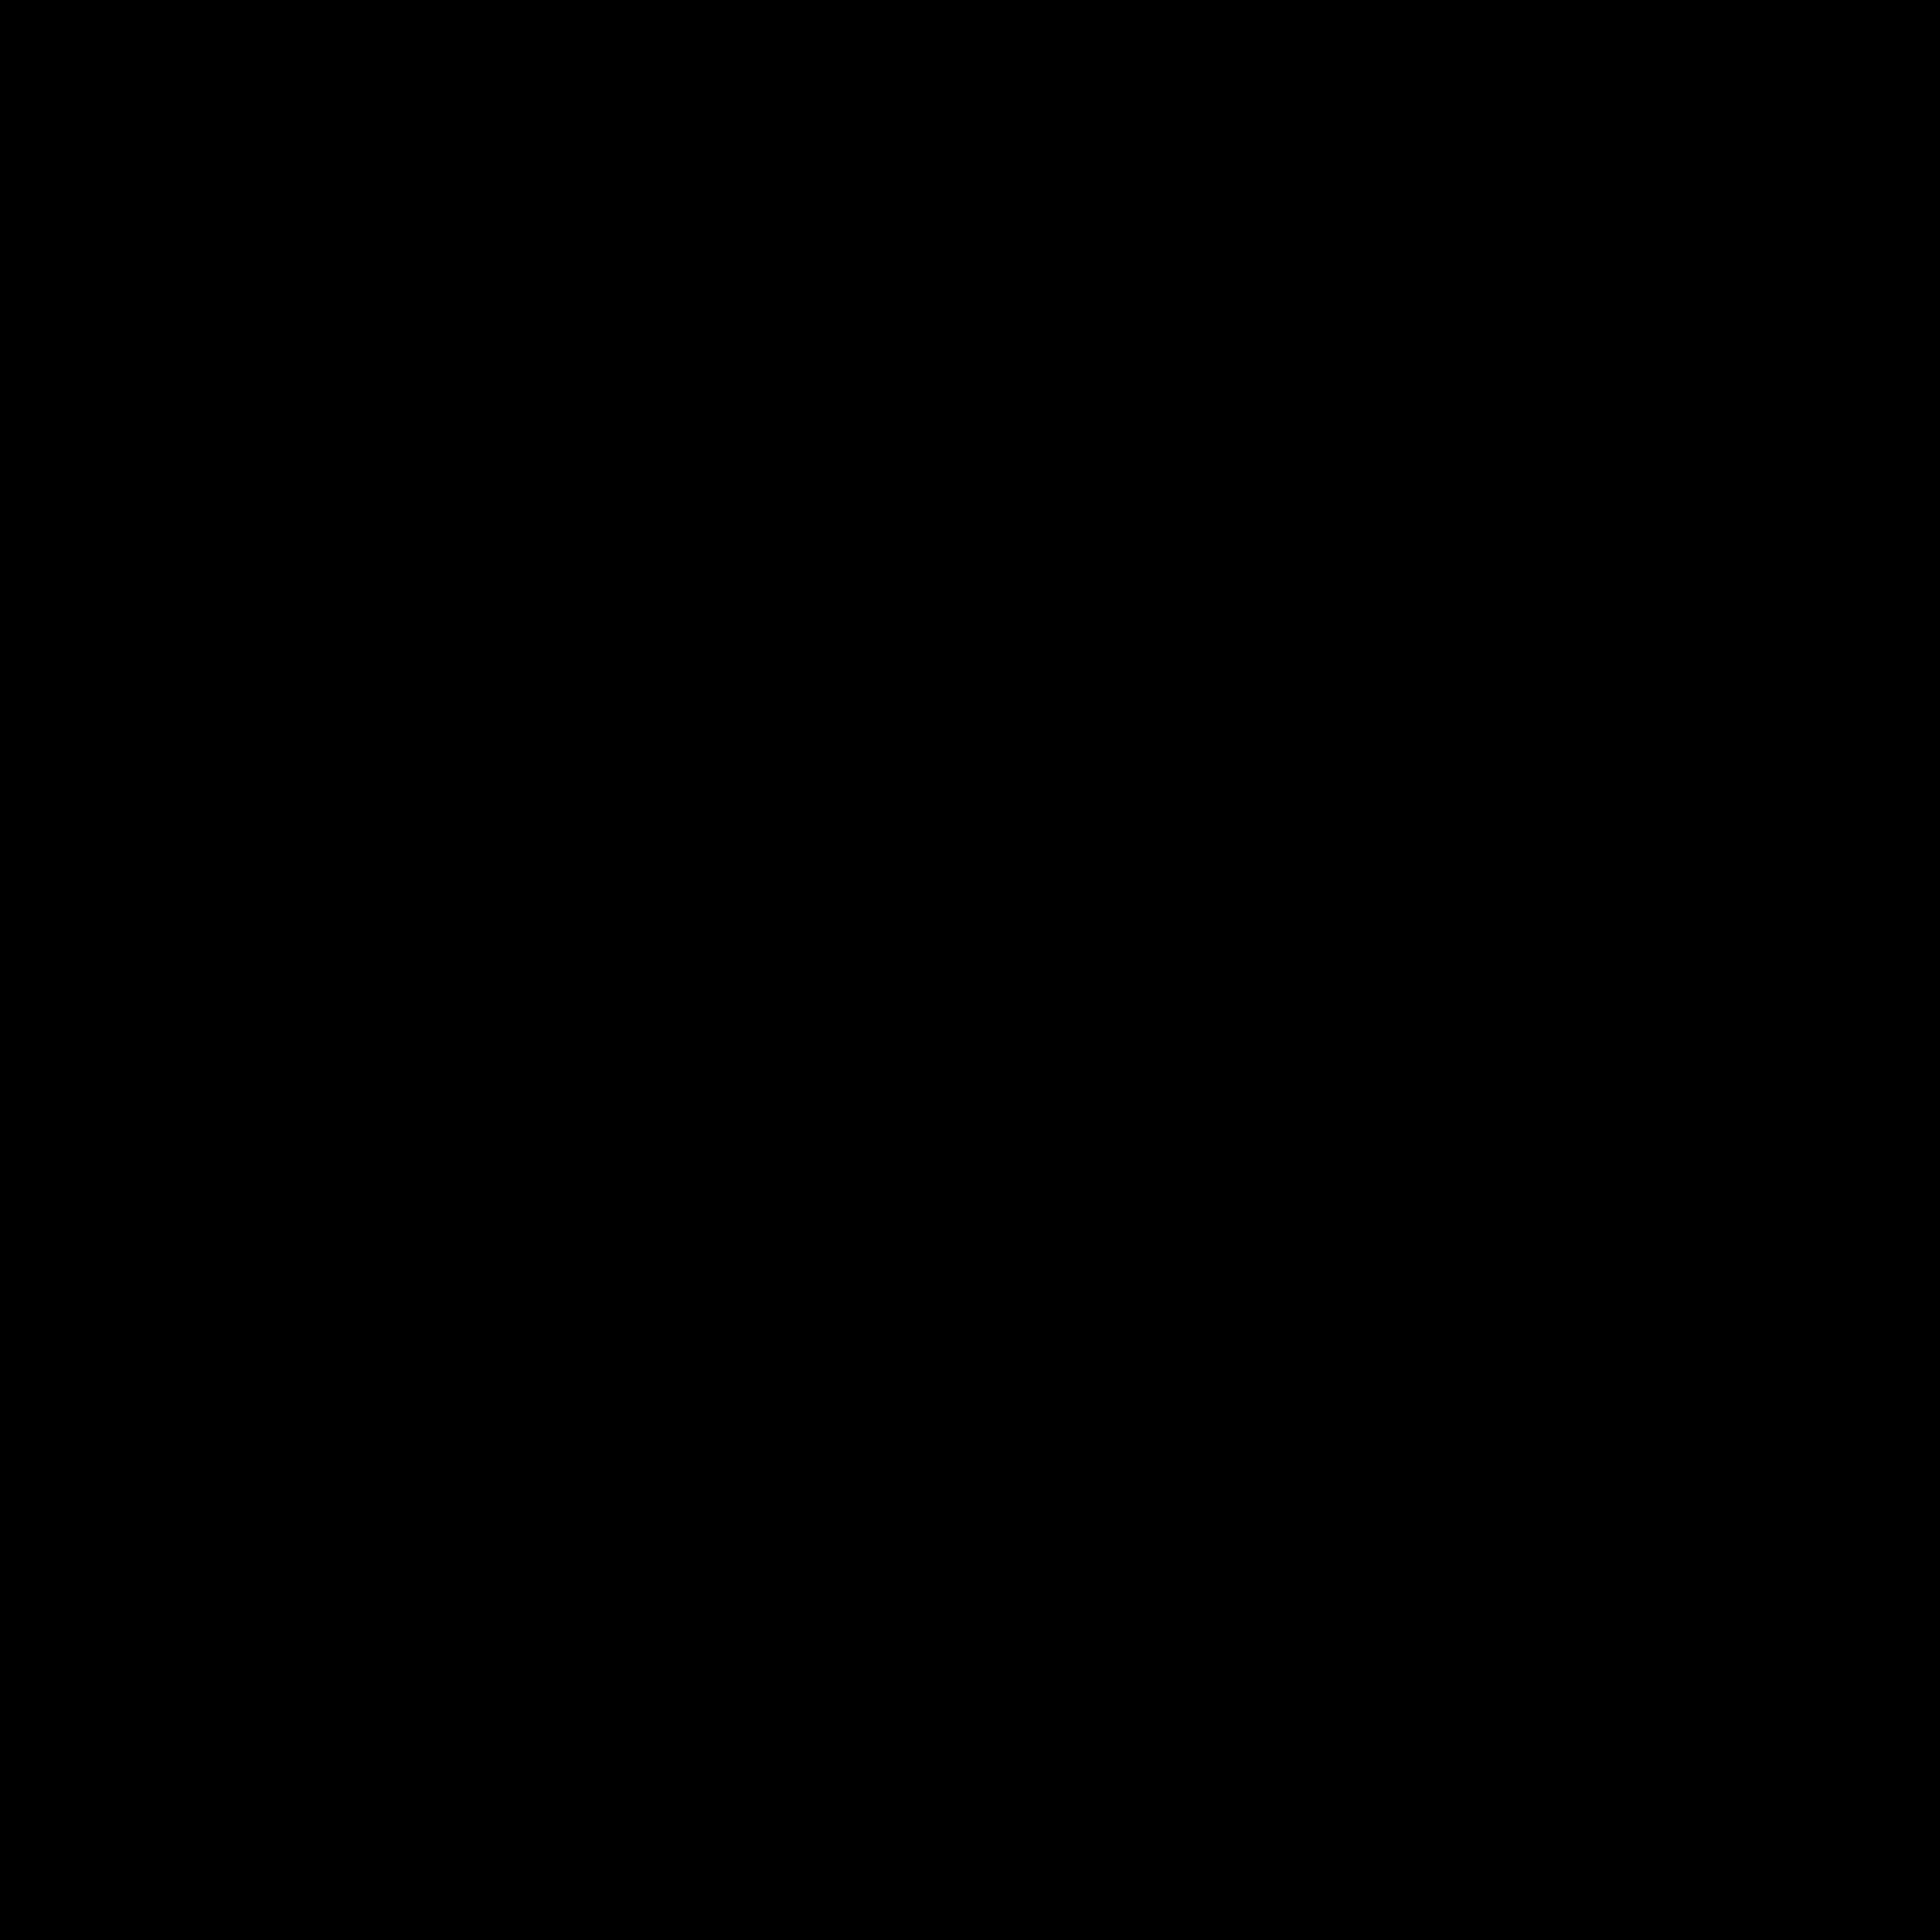 main-logo-blk.png